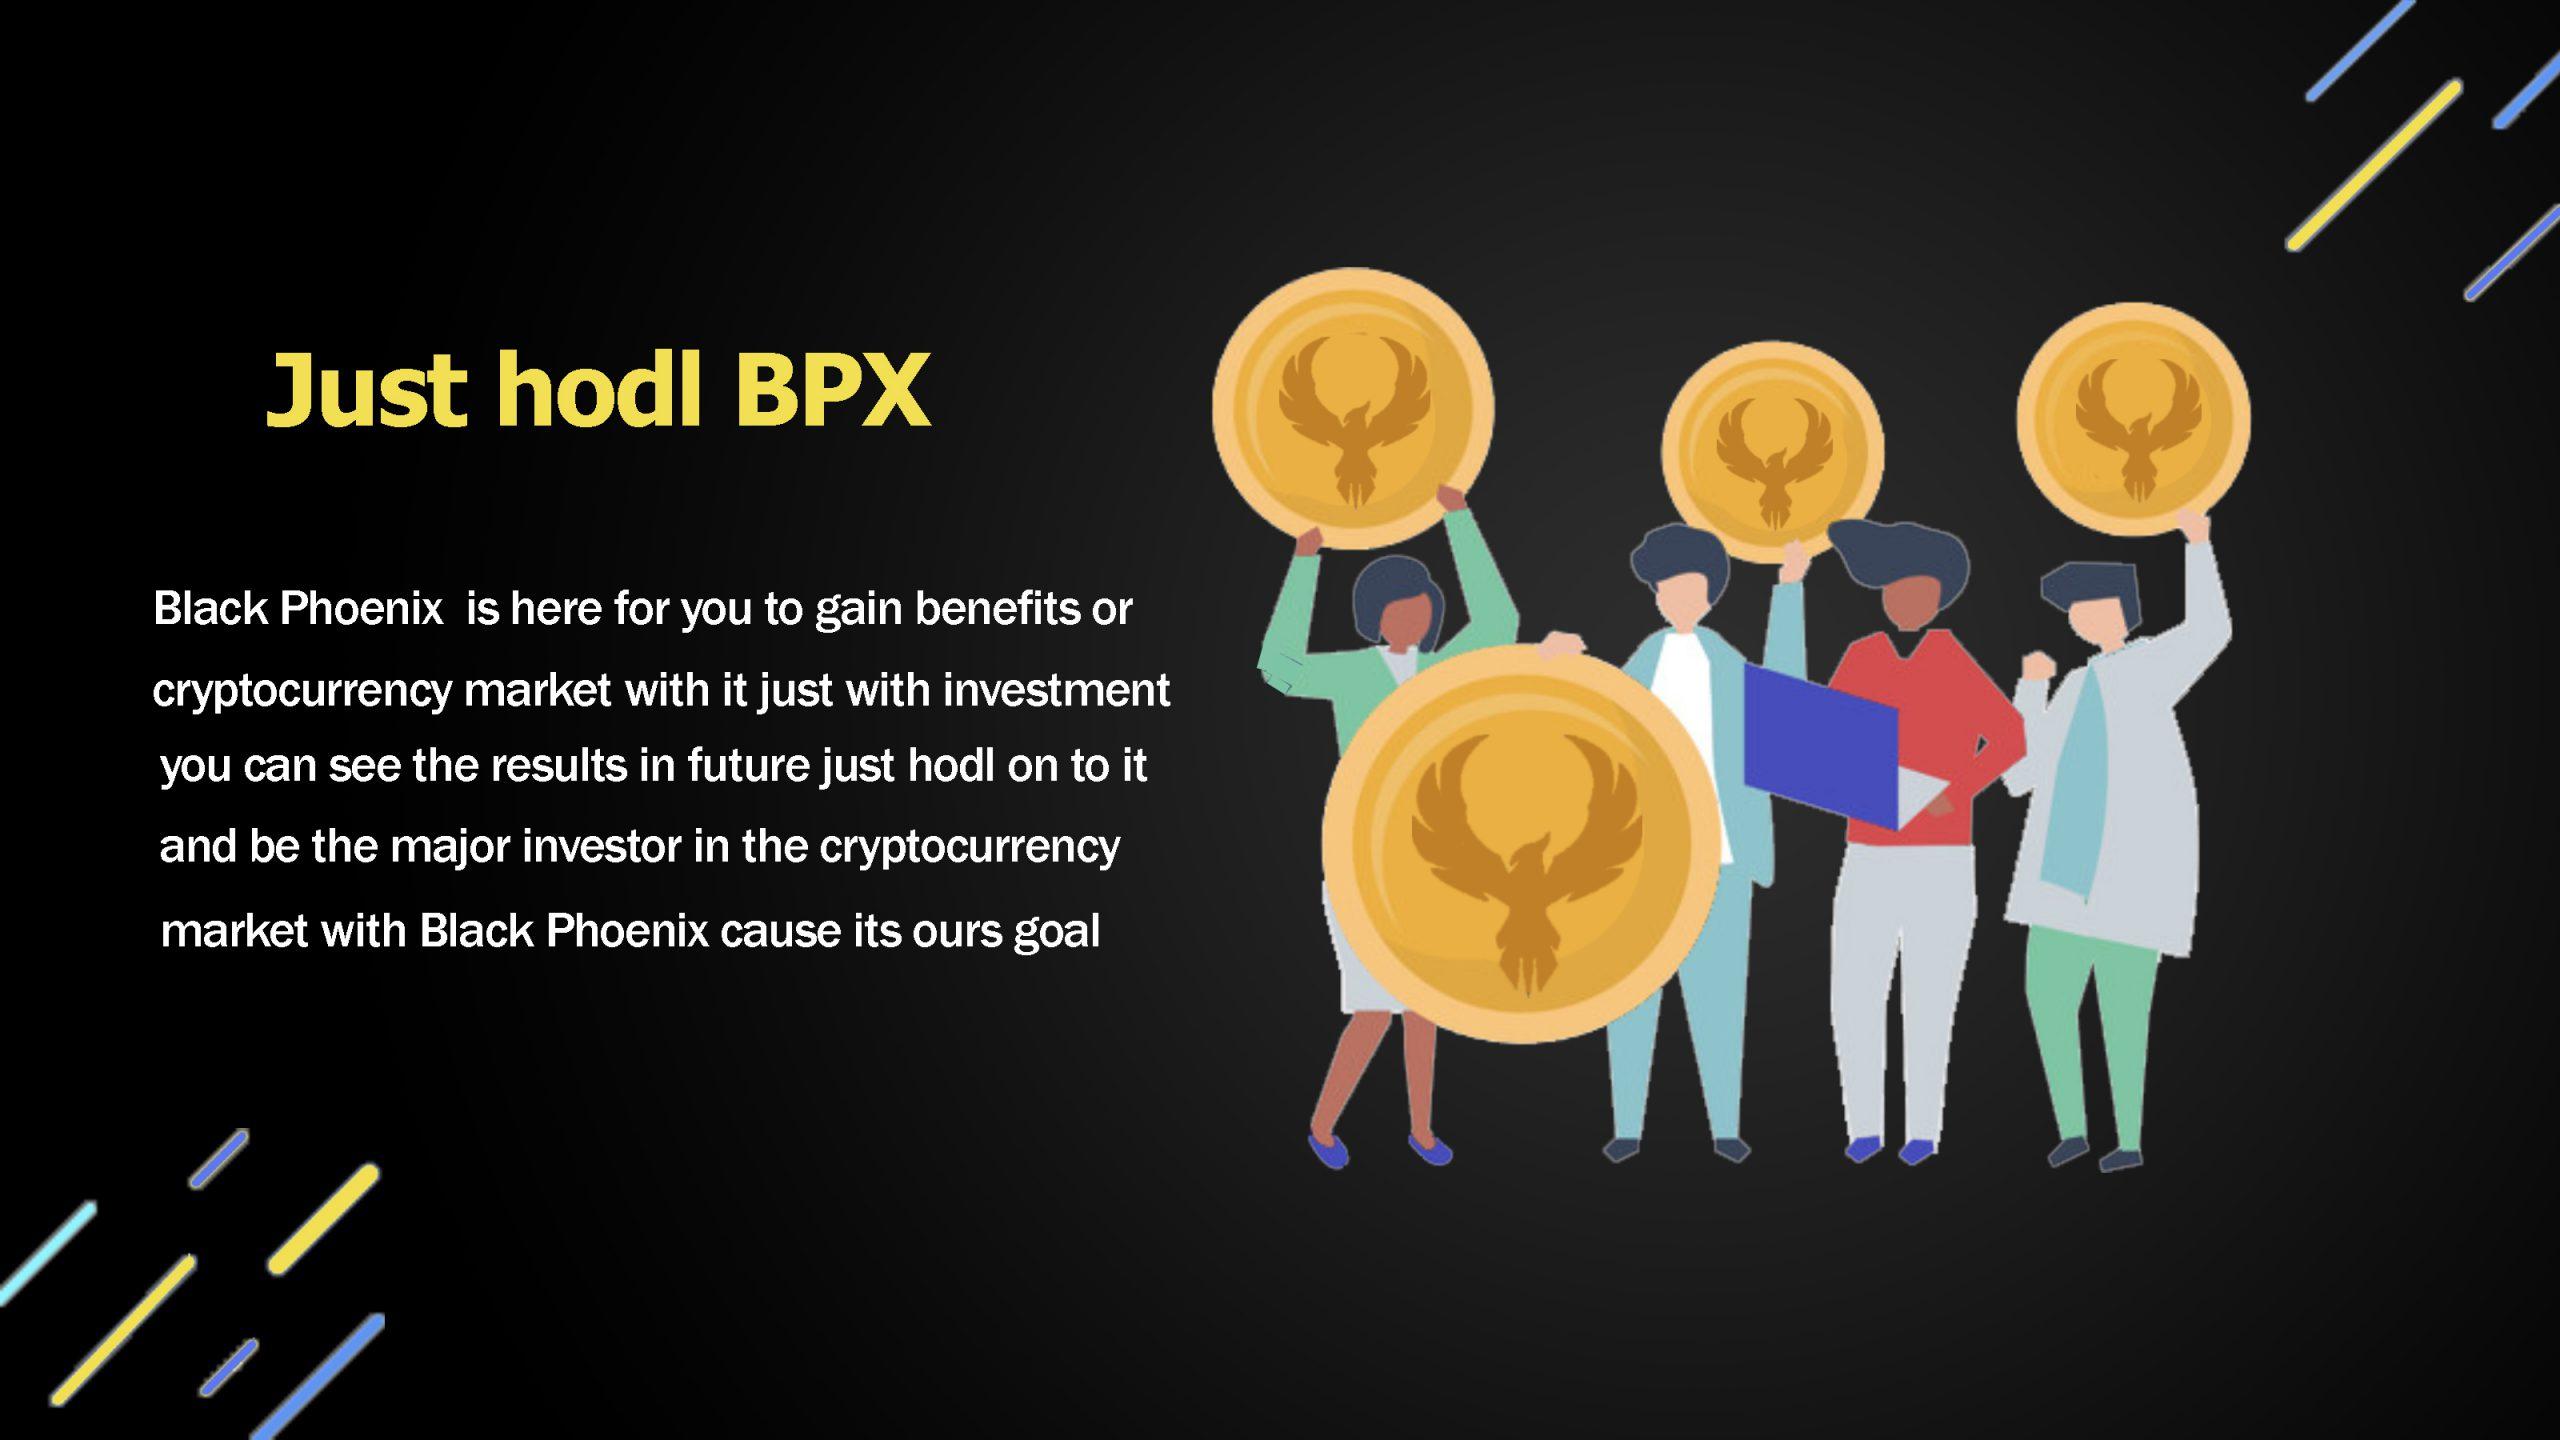 HODL BPX , کریپتو کارنسی , بیت کوین , اتریوم , ترون , ارز دیجیتال , بازار مالی , Cryptocurrency , crypto , bitcoin , BTC , ETH , Ether , Ethereum , Blockchain , cryptocurrency market , digital marketing , TRX , TRC20 , Tron , Tronscan , Black Phoenix , BPX , Fastest Blockchain